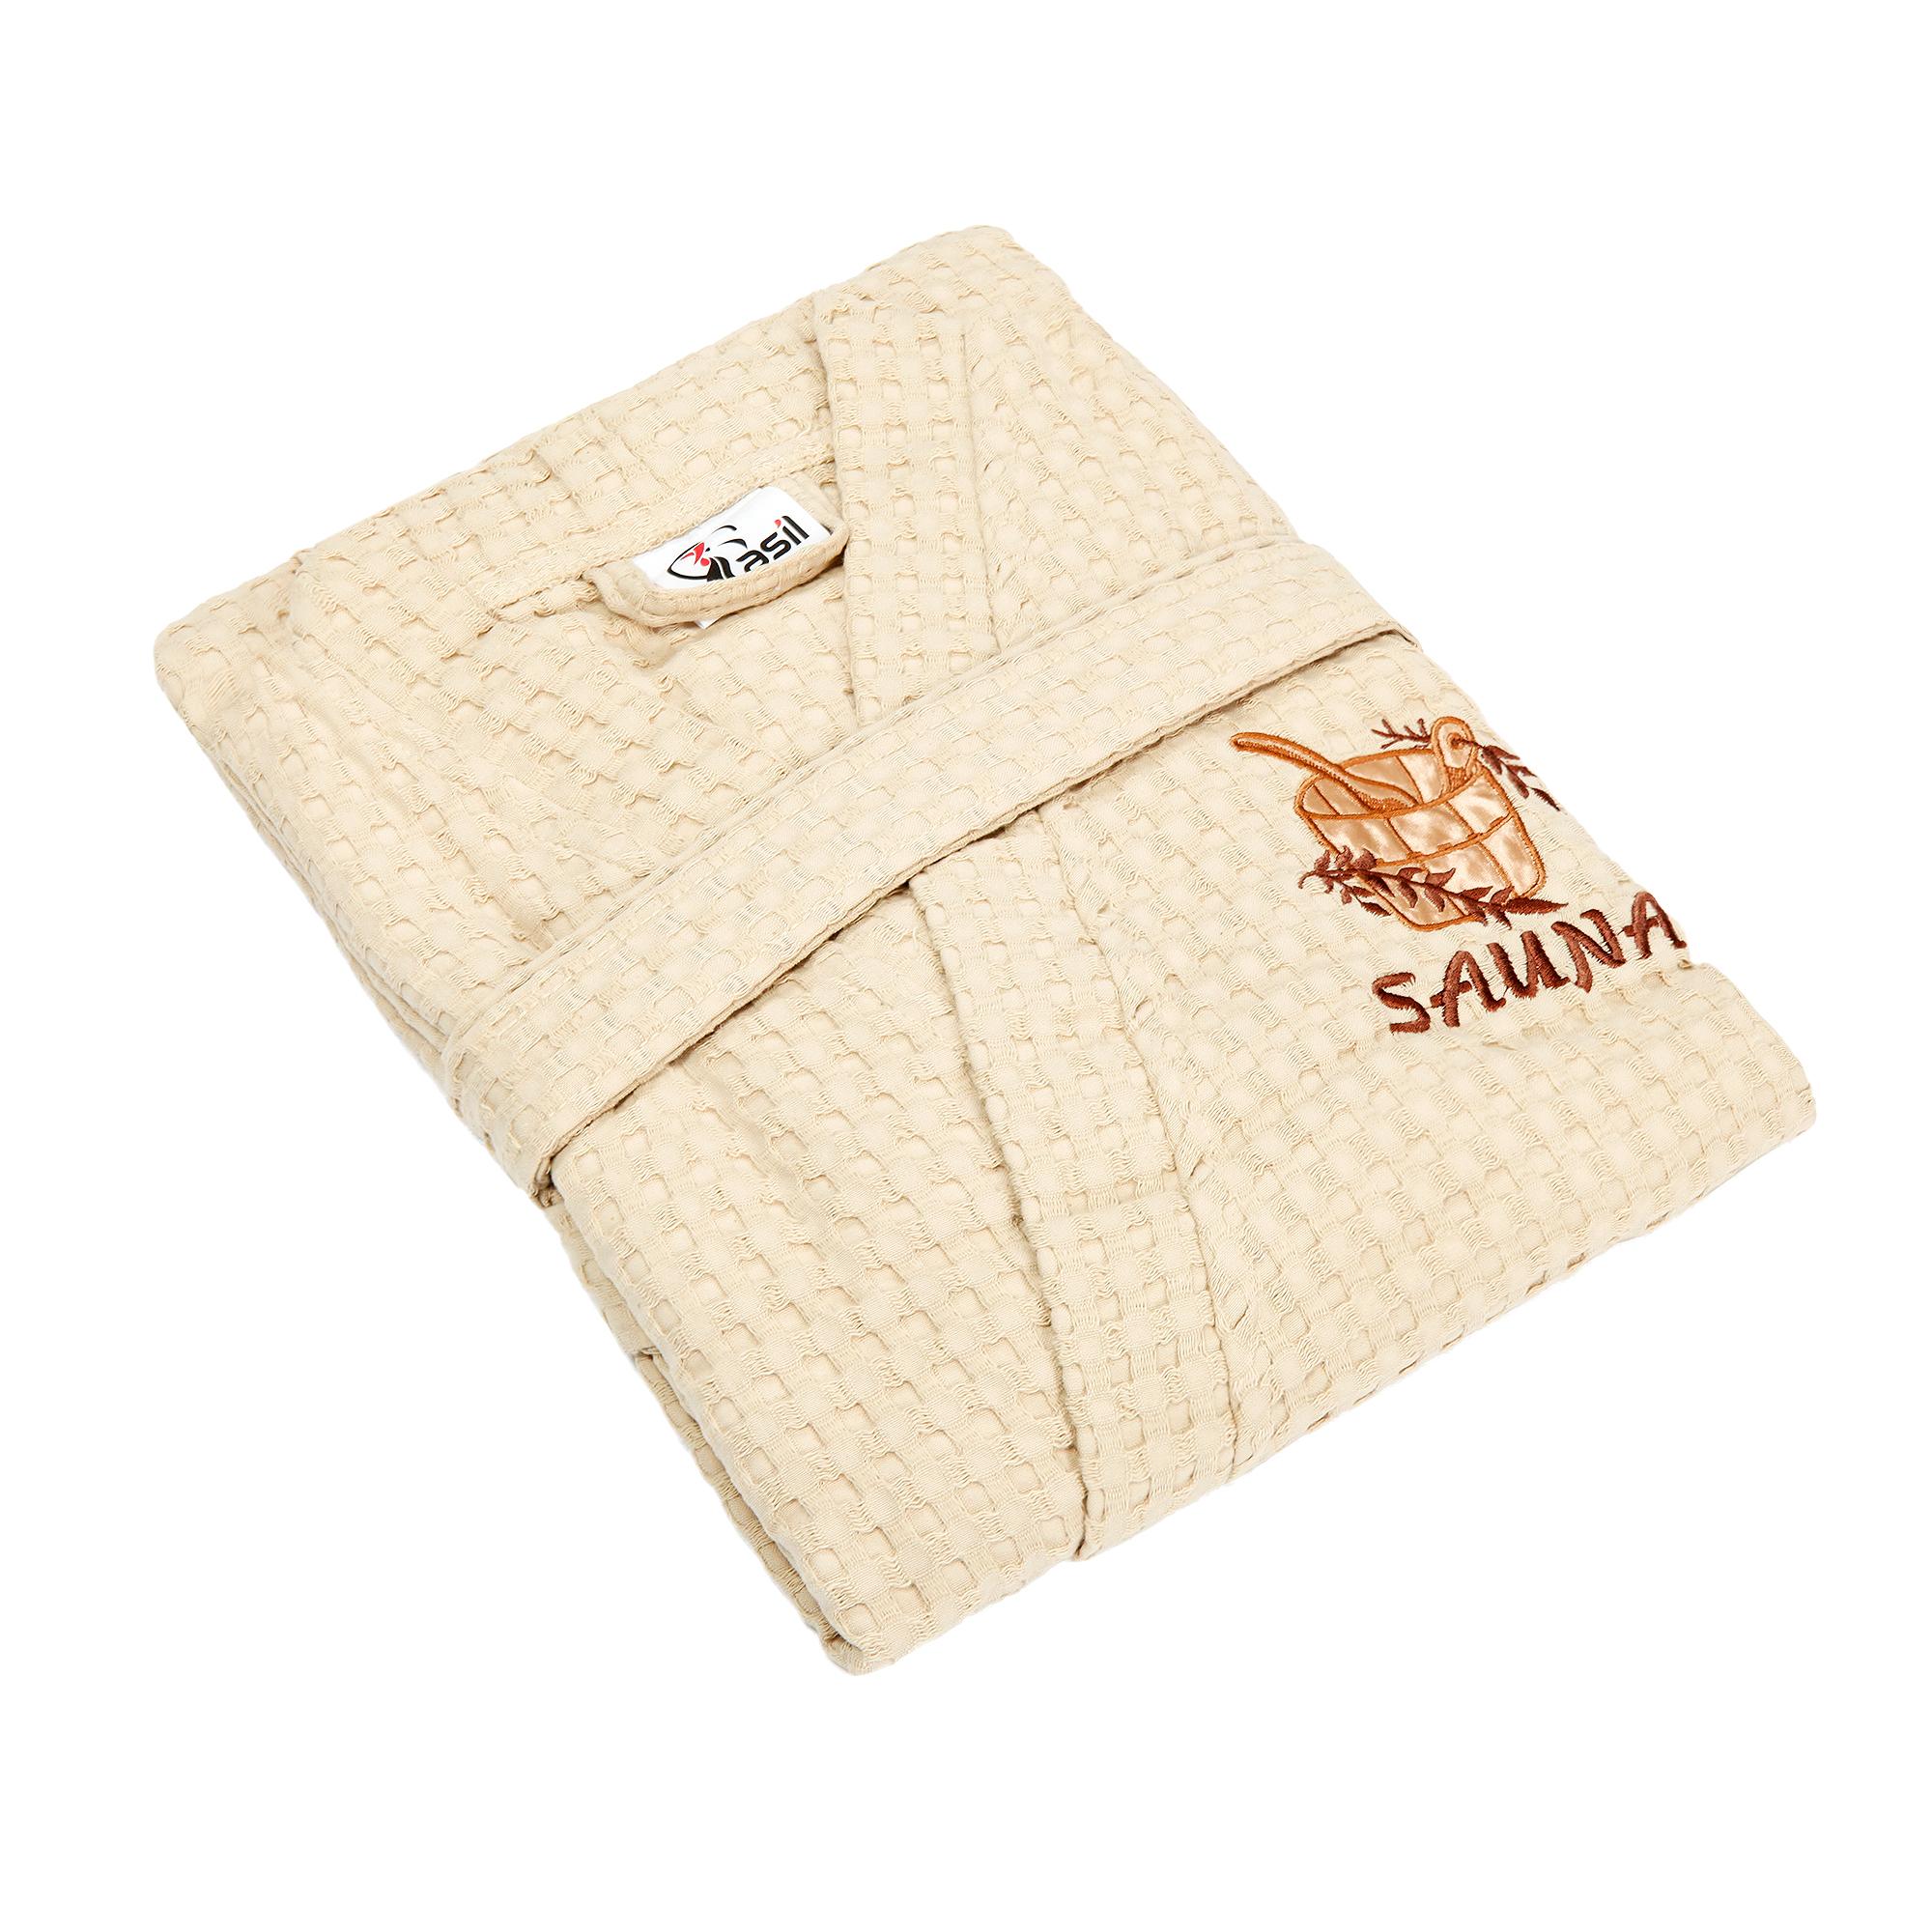 халат roberto cavalli araldico xxl brown Халат мужской Asil sauna kimono brown xxl вафельный